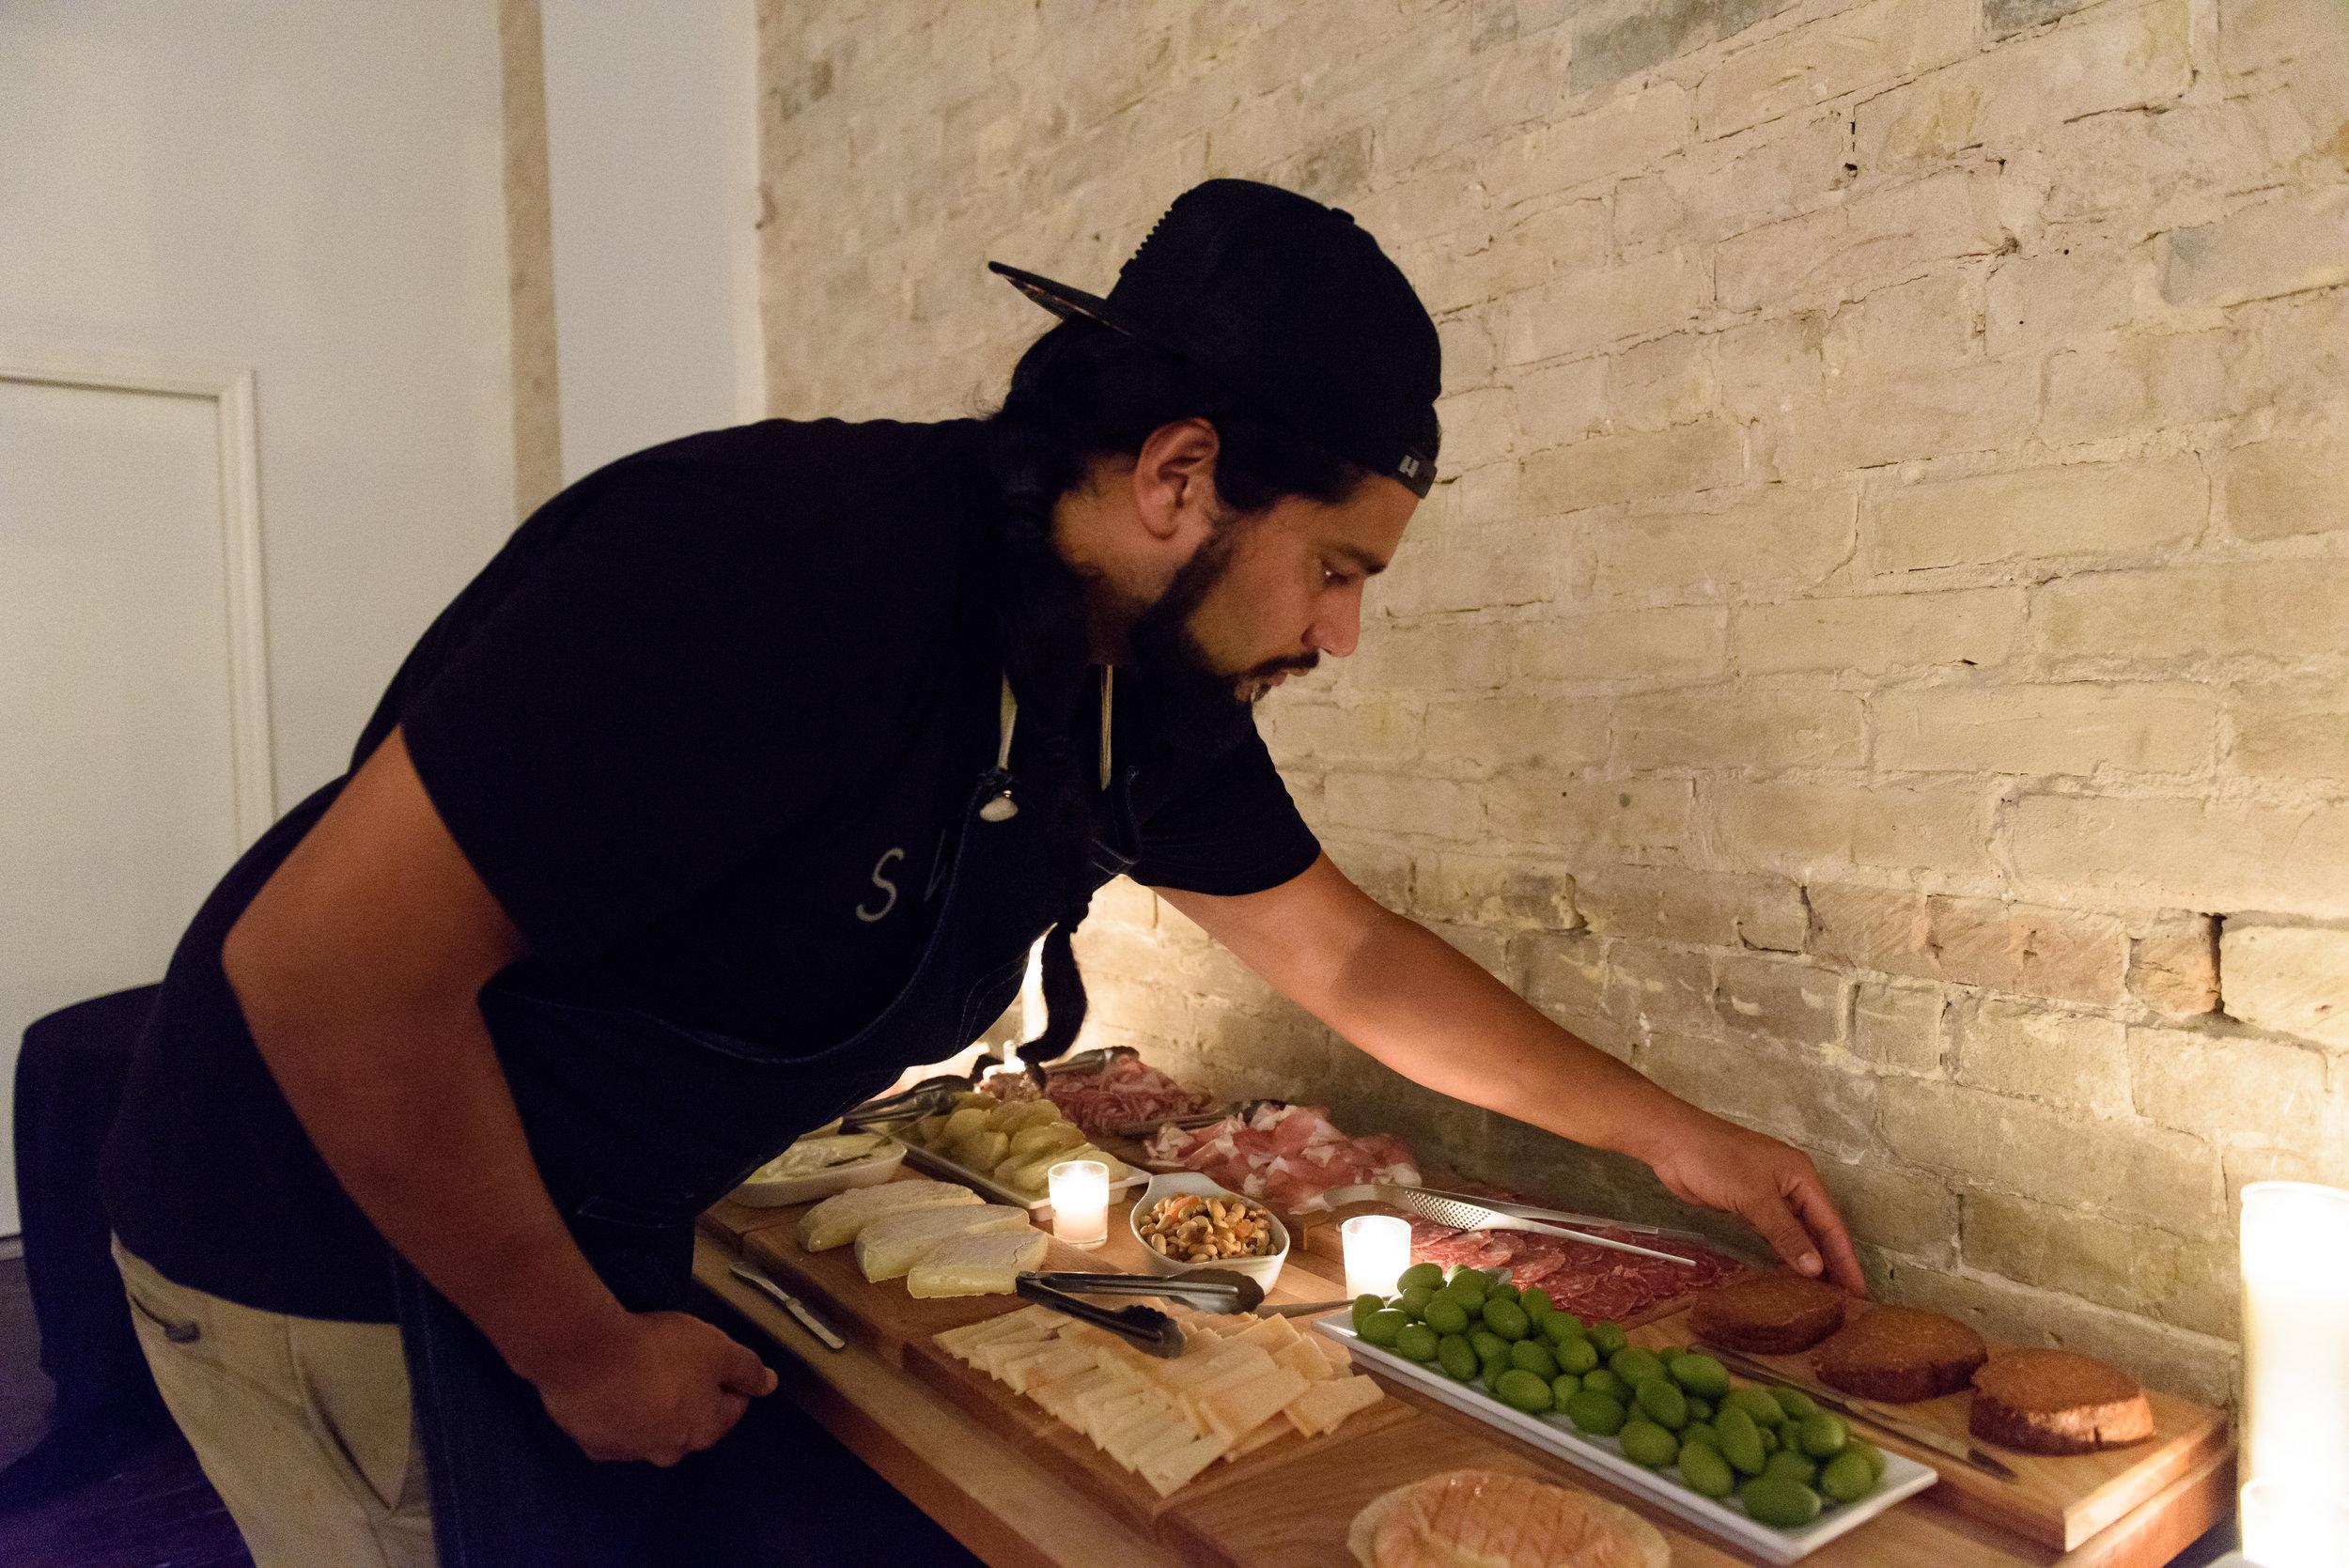 Chef Joe Saenz prepares a charcuterie spread for a recent Saint City Supper Club event. Photo by Louie Preciado.